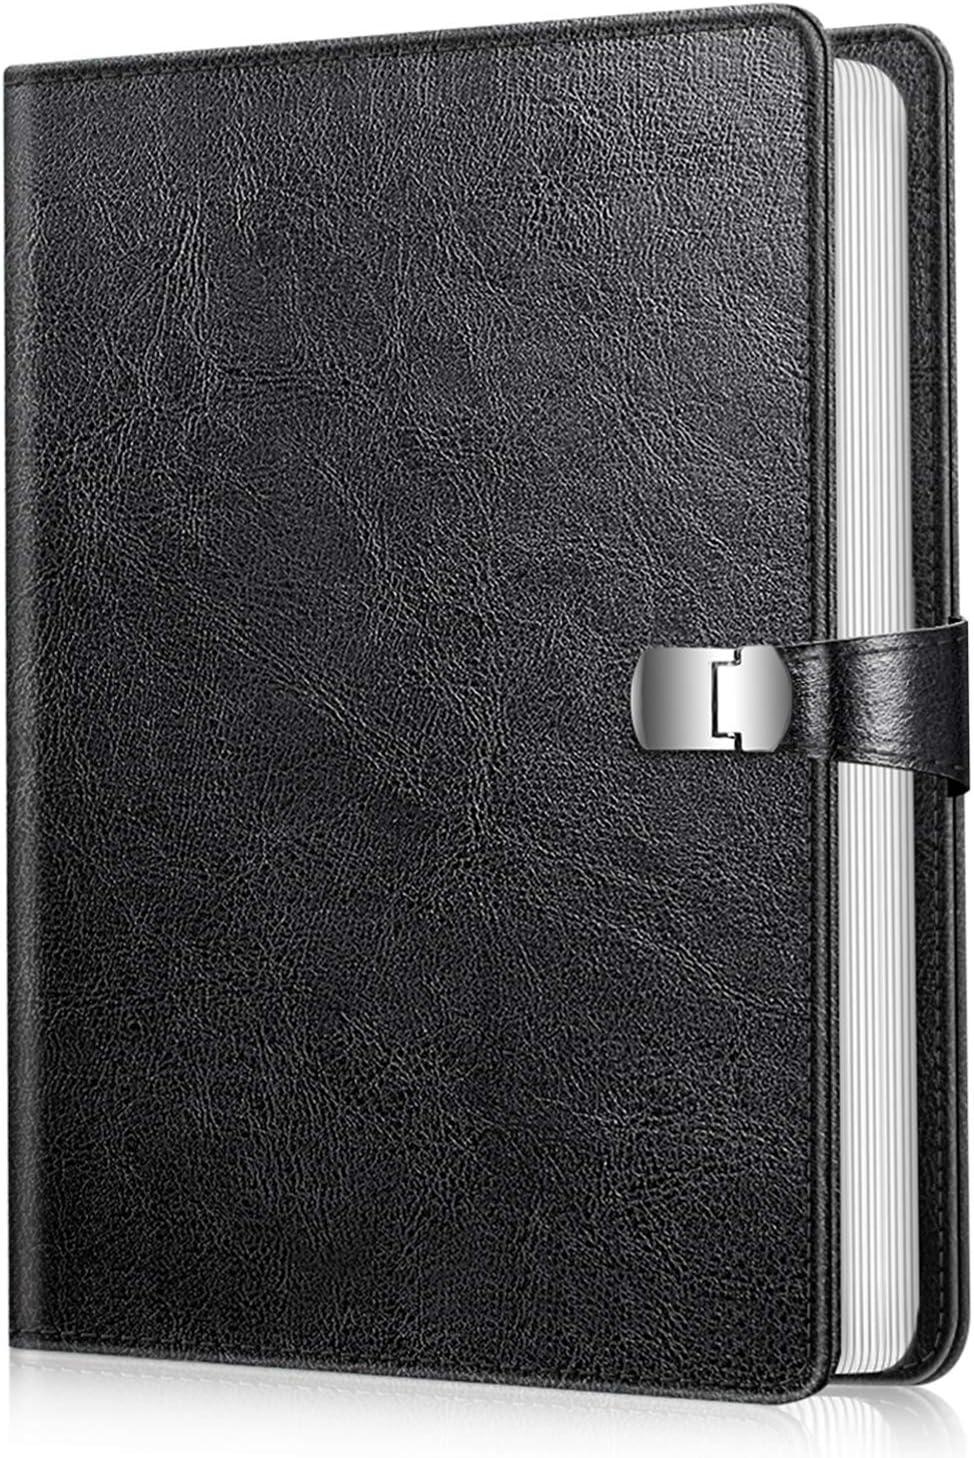 Fintie Photo Album 4x6 Photos - 112 Photos Premium Vegan Leather Cover with Snap Fastener, Portable Wallet Photo Albums (Black)